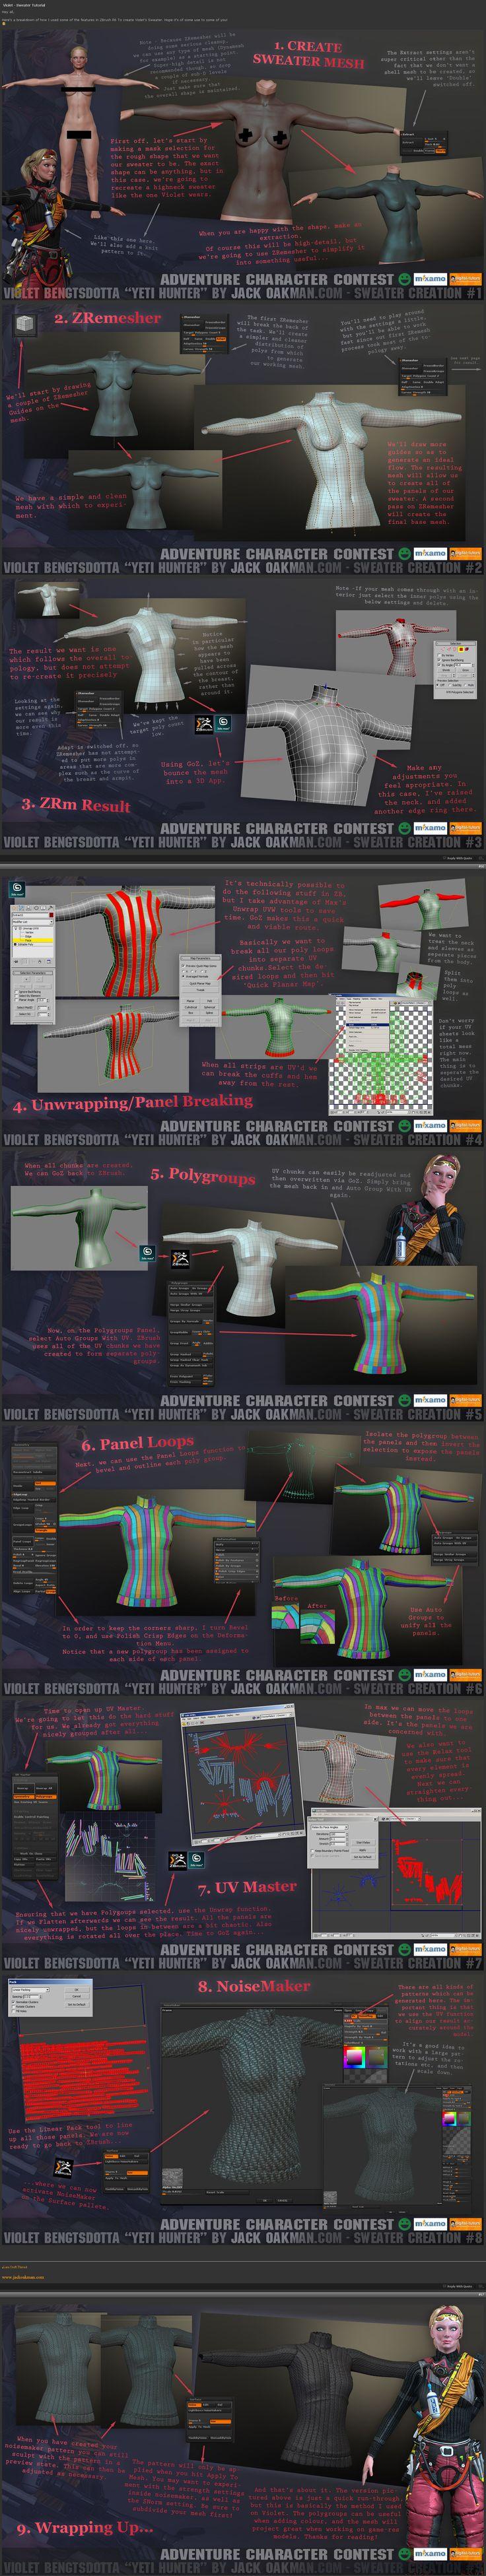 Sweater in Zbrush 4R6 #3d #sculpting #tutorials